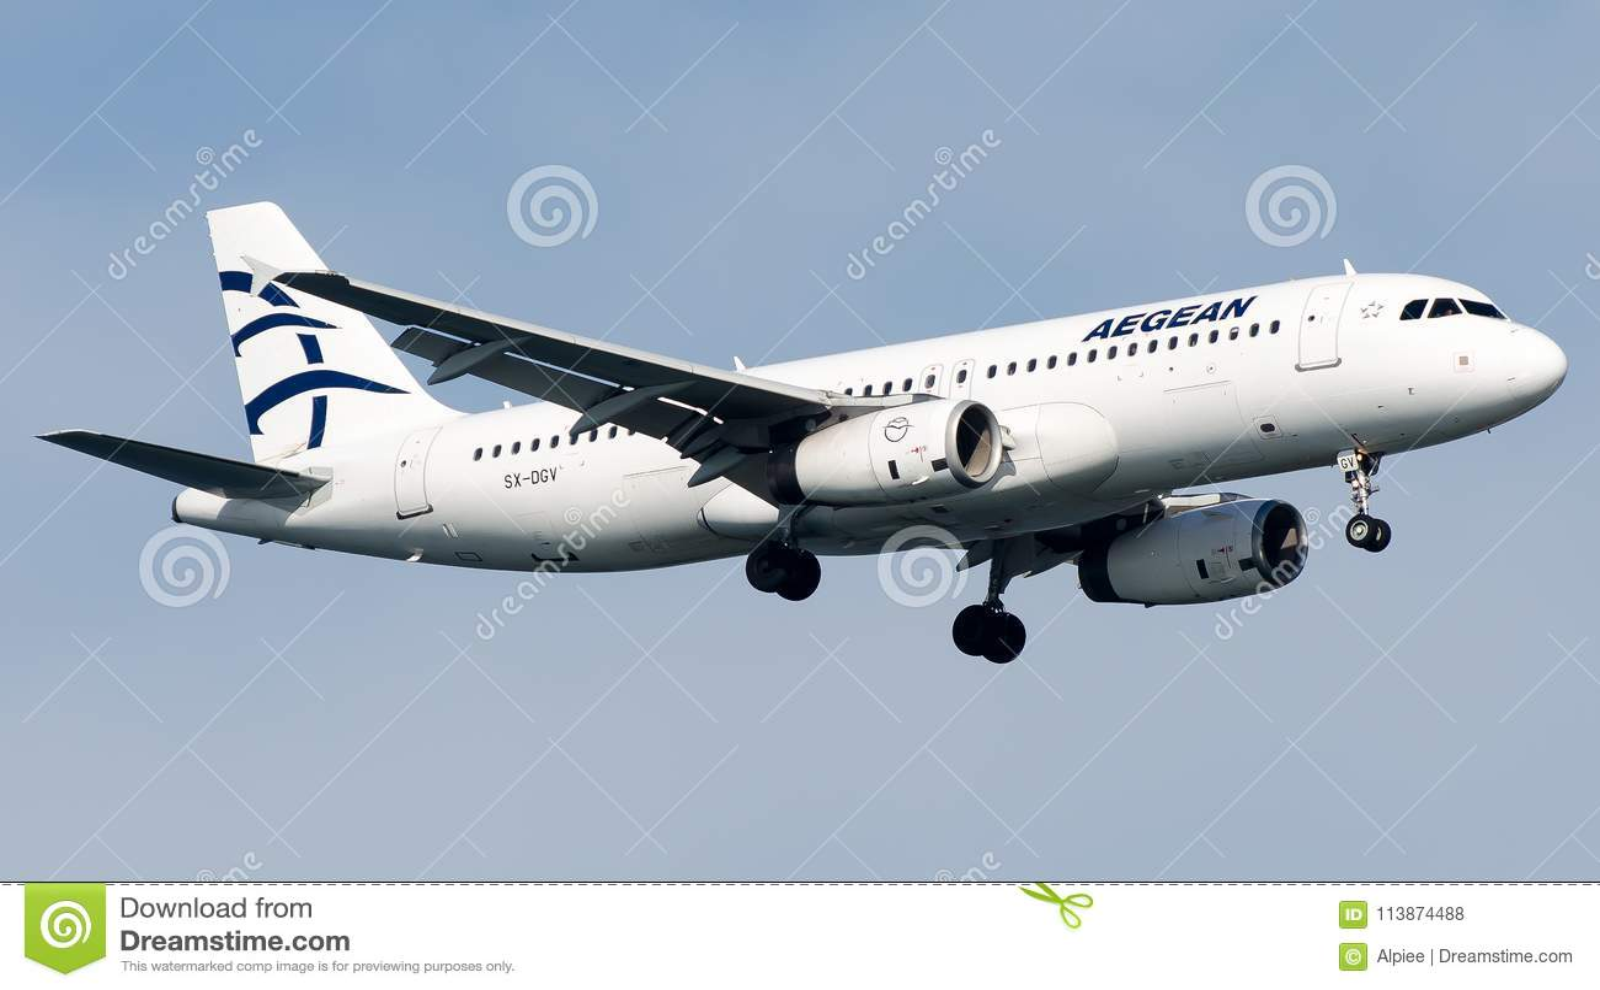 SX-DGV Aegean Airlines, Airbus A320-200